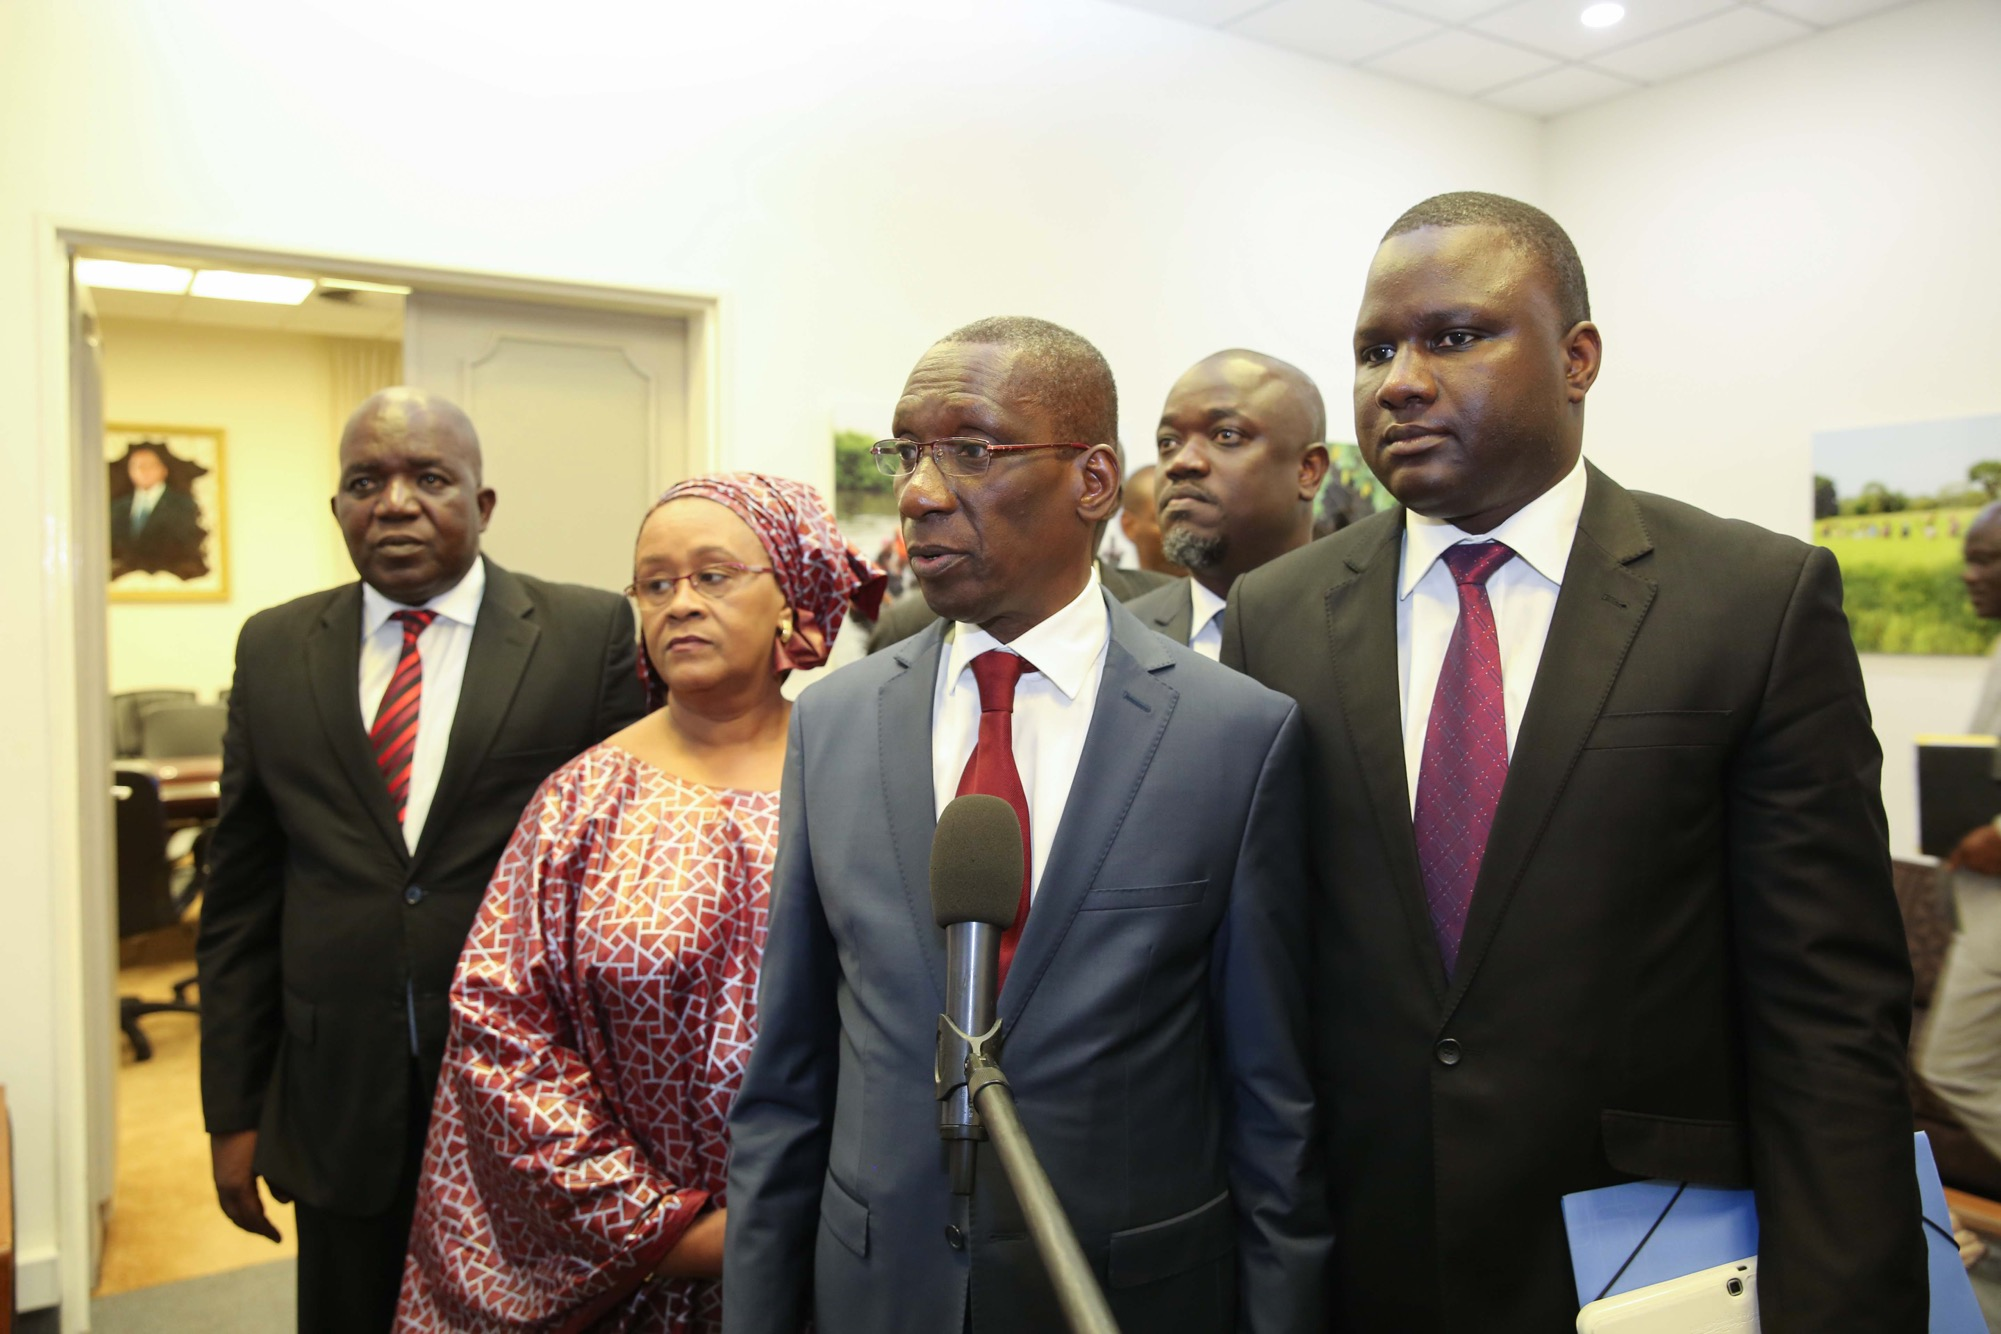 Issue de leur audience avec Macky Sall :  Le front Mànkoo Wattu Senegaal se prononce demain